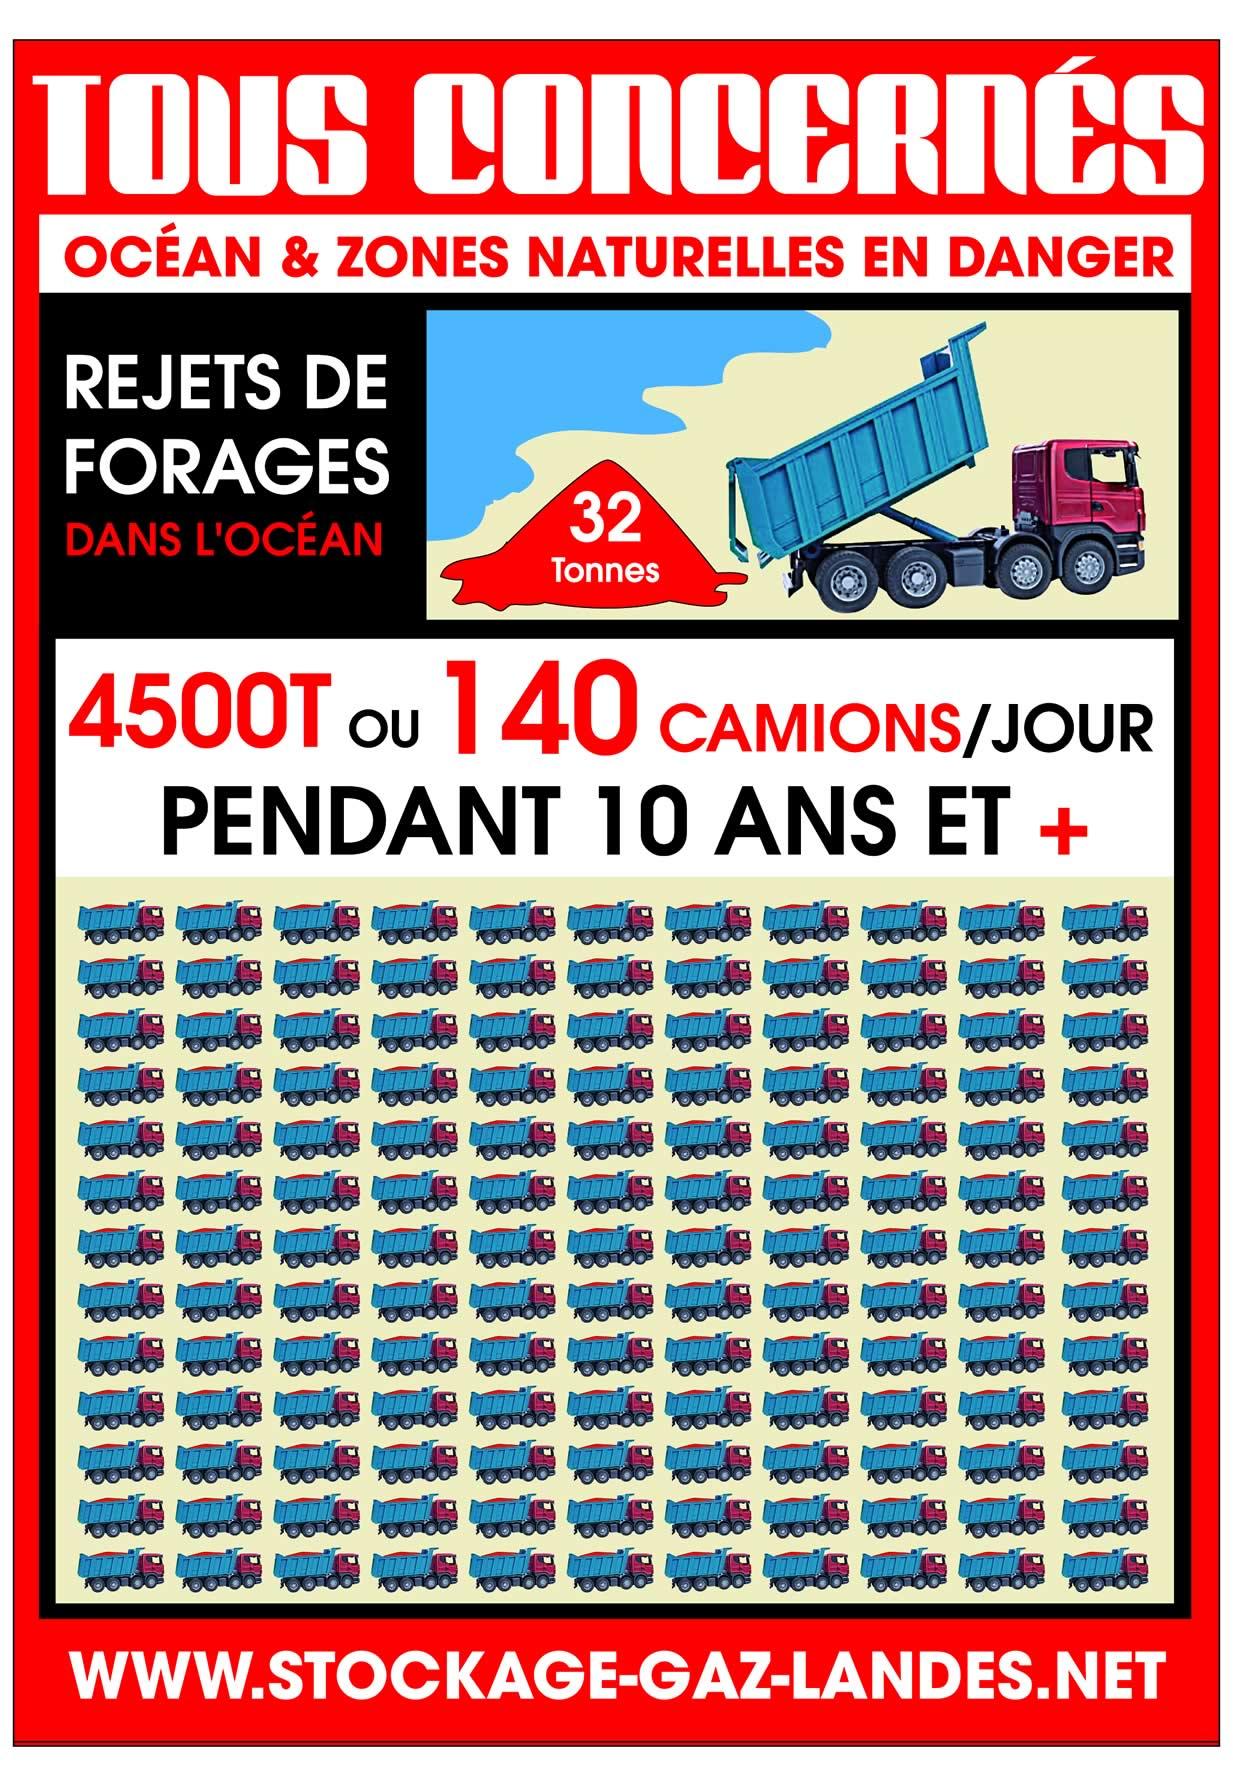 140 Camions Jour - www.stockage-gaz-landes.net